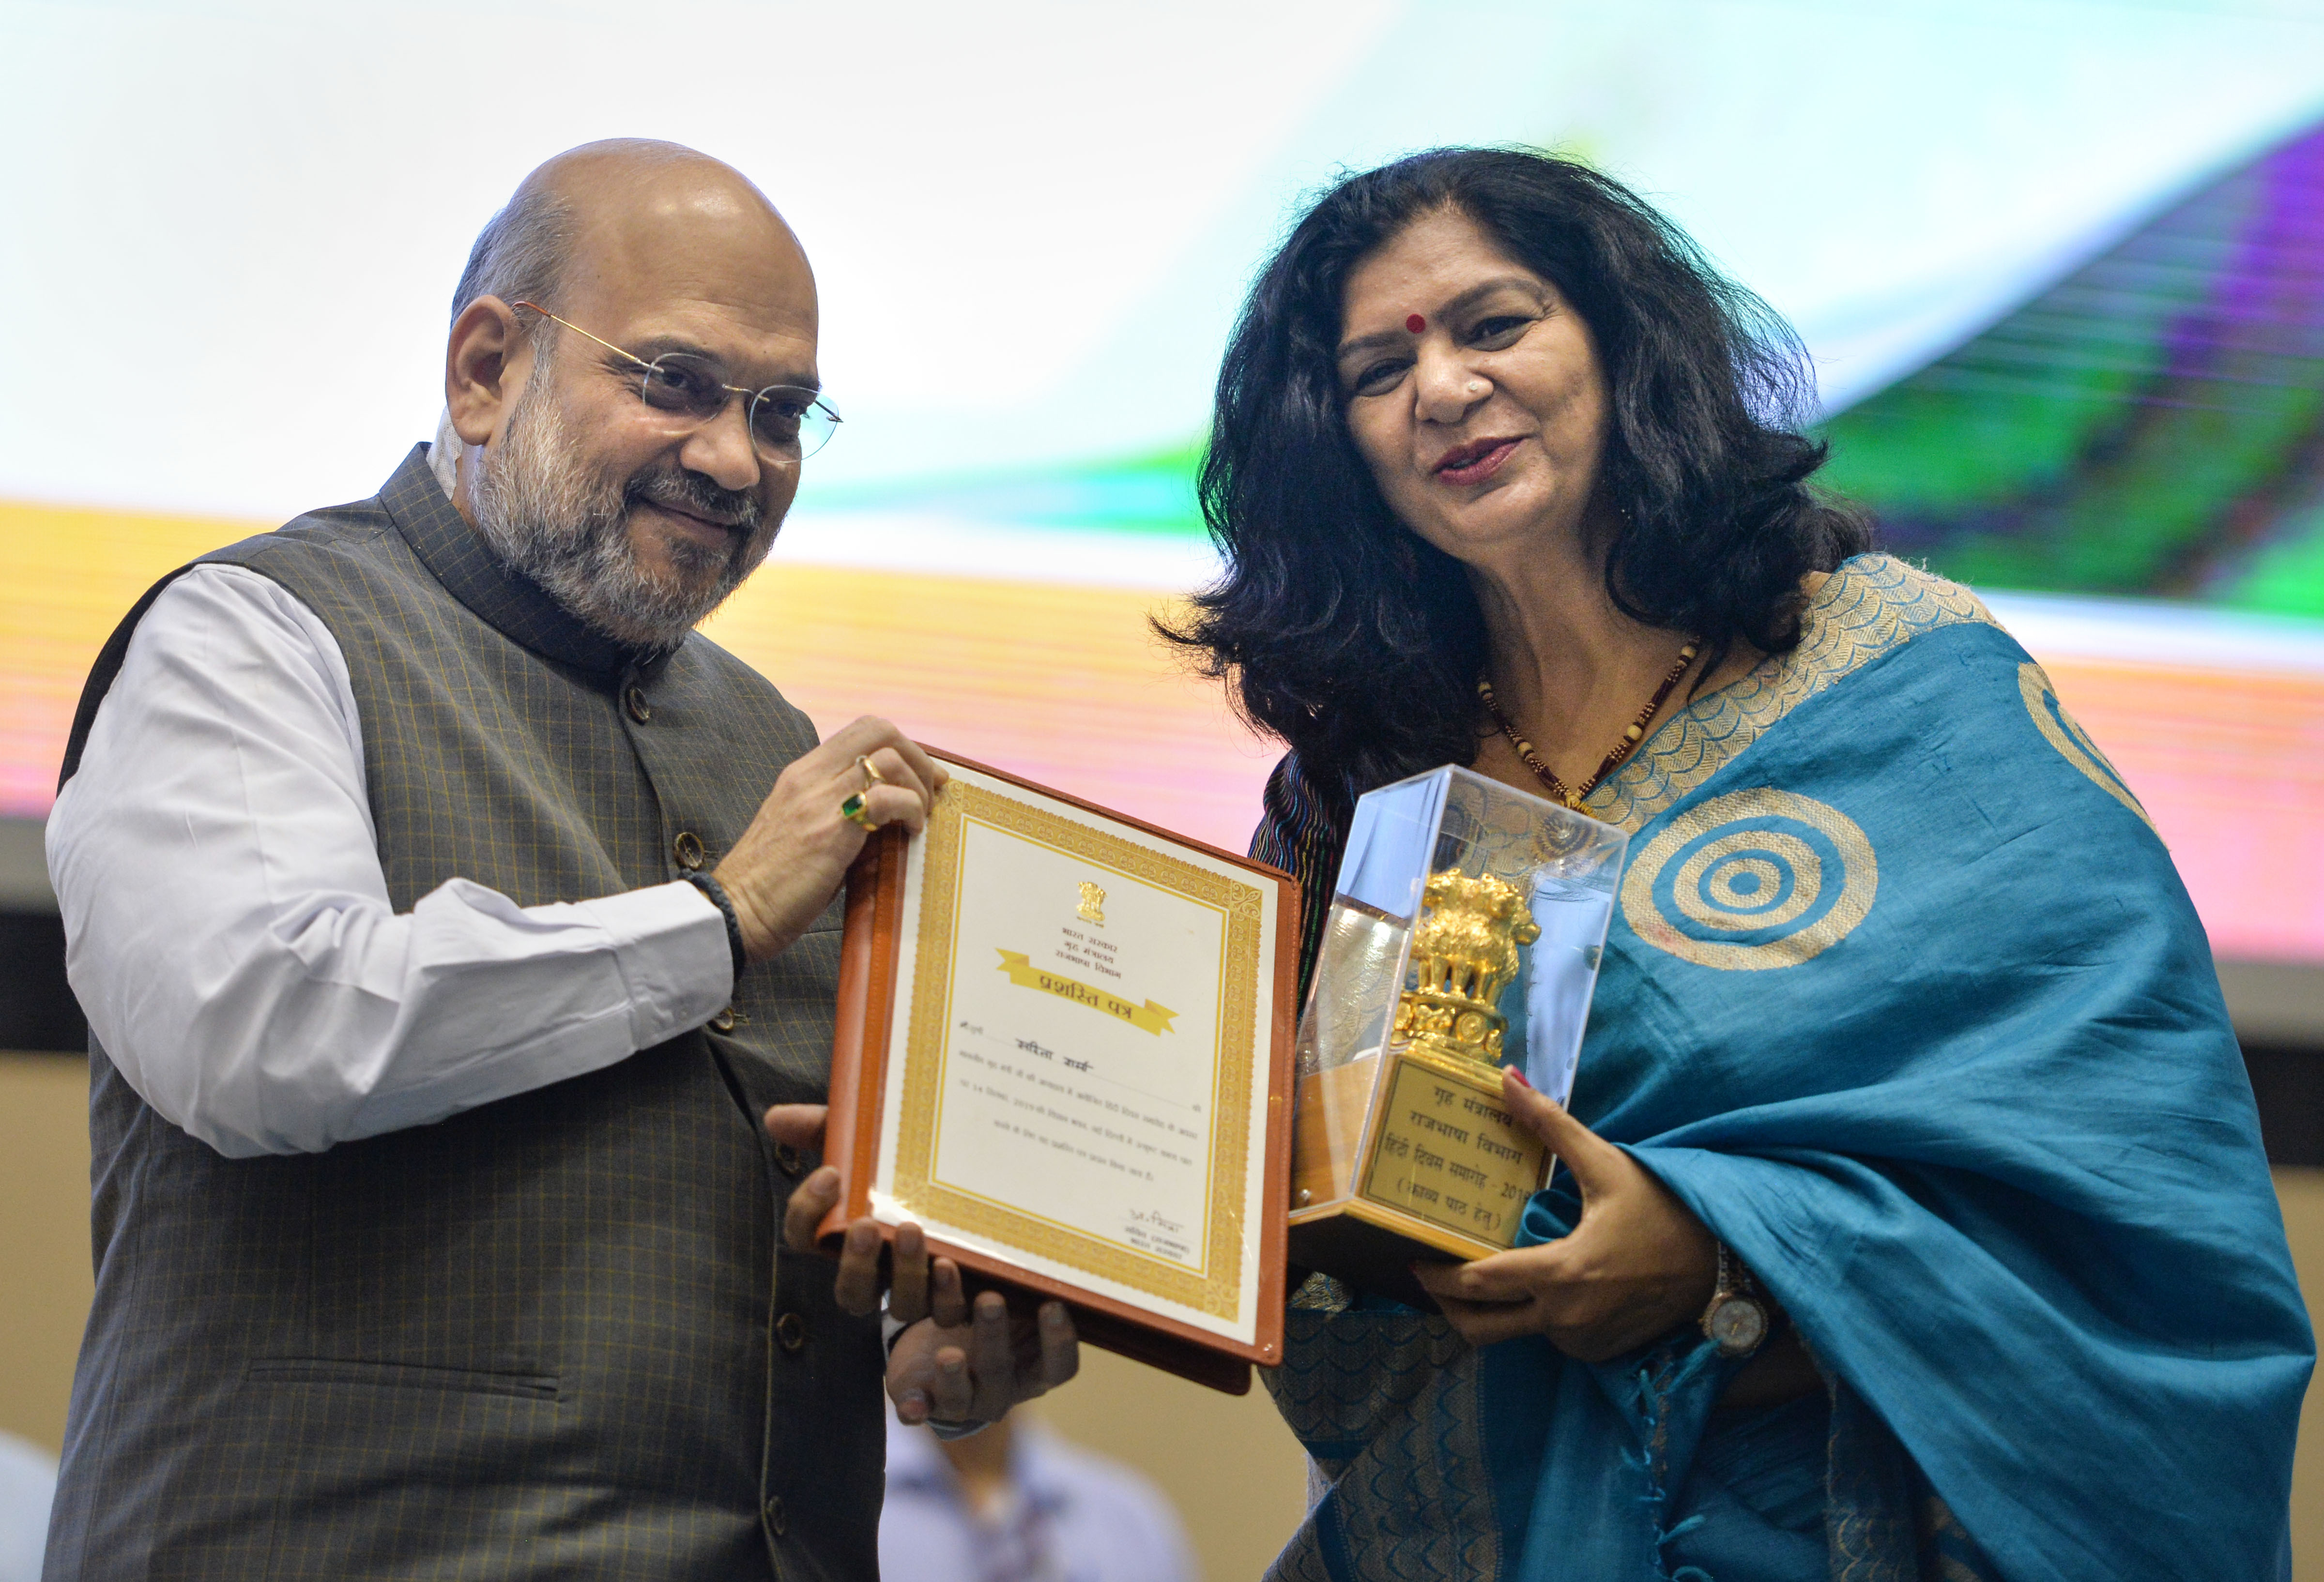 Union home minister Amit Shah presents an award to poet Sarita Sharma during Hindi Divas Samaroh in New Delhi, Saturday, September 14, 2019